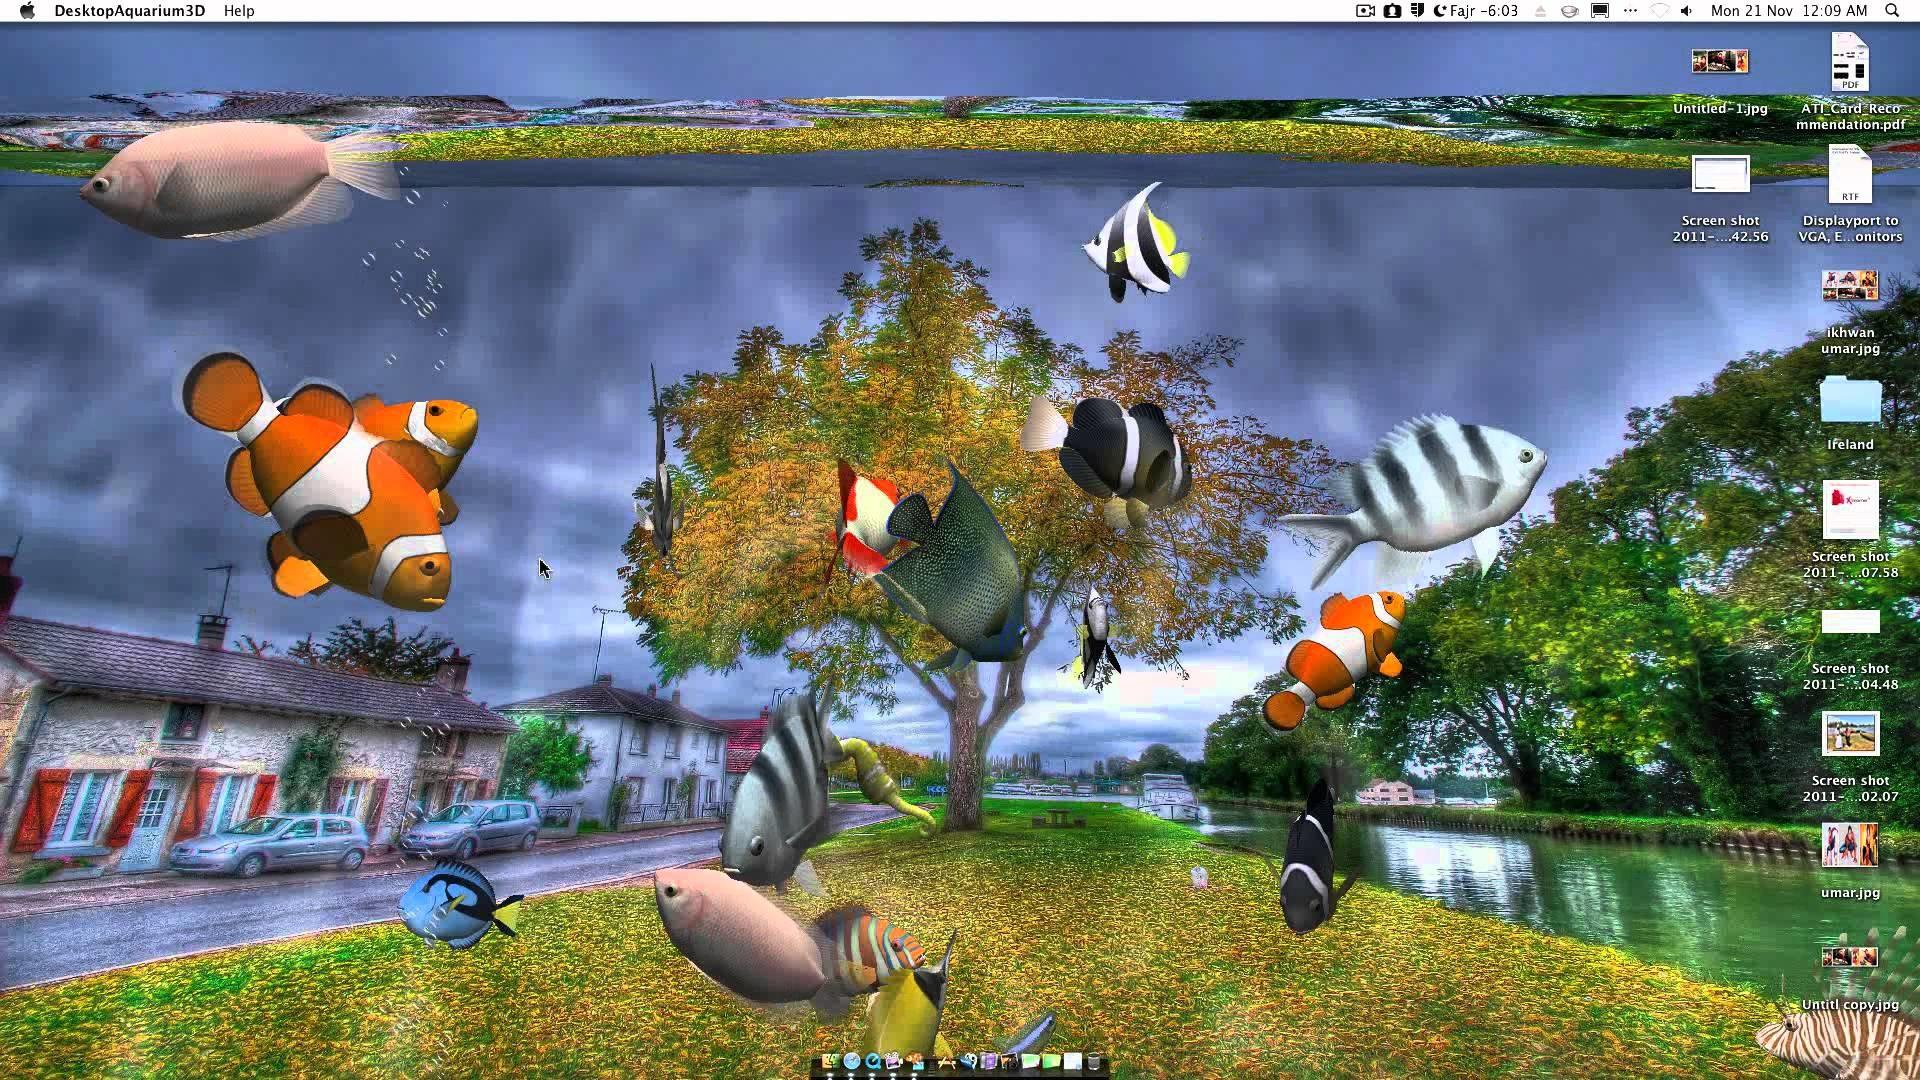 Liquid Live Desktop Wallpaper Screensaver Free download and 1600×1000  Download Wallpapers Live For PC